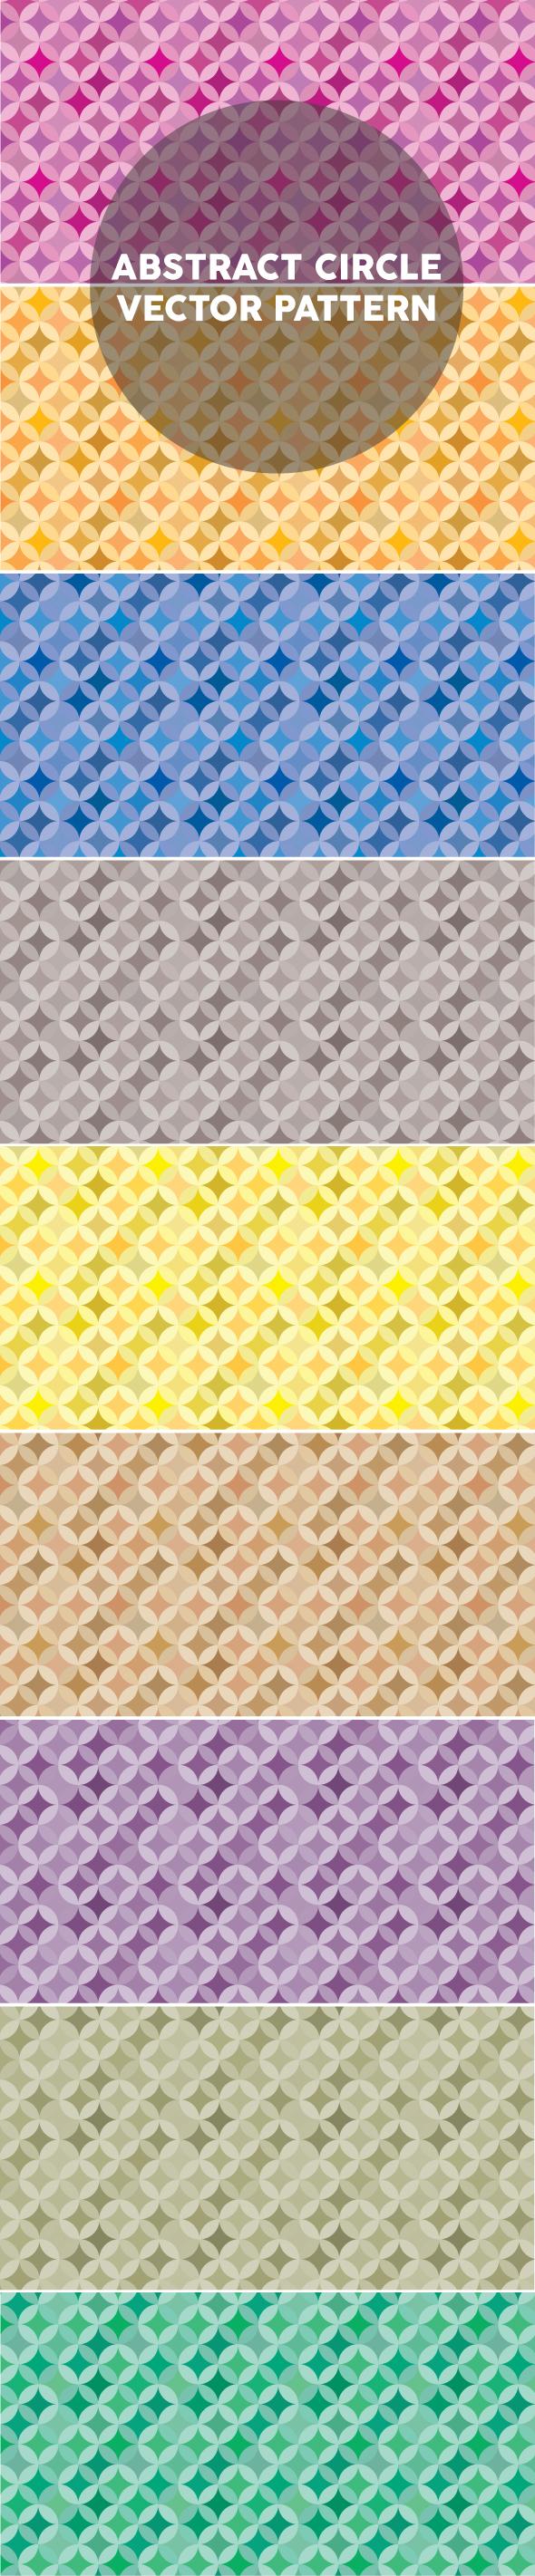 abstract circle pattern edition 2 Abstract circle seamless vector pattern edition 2